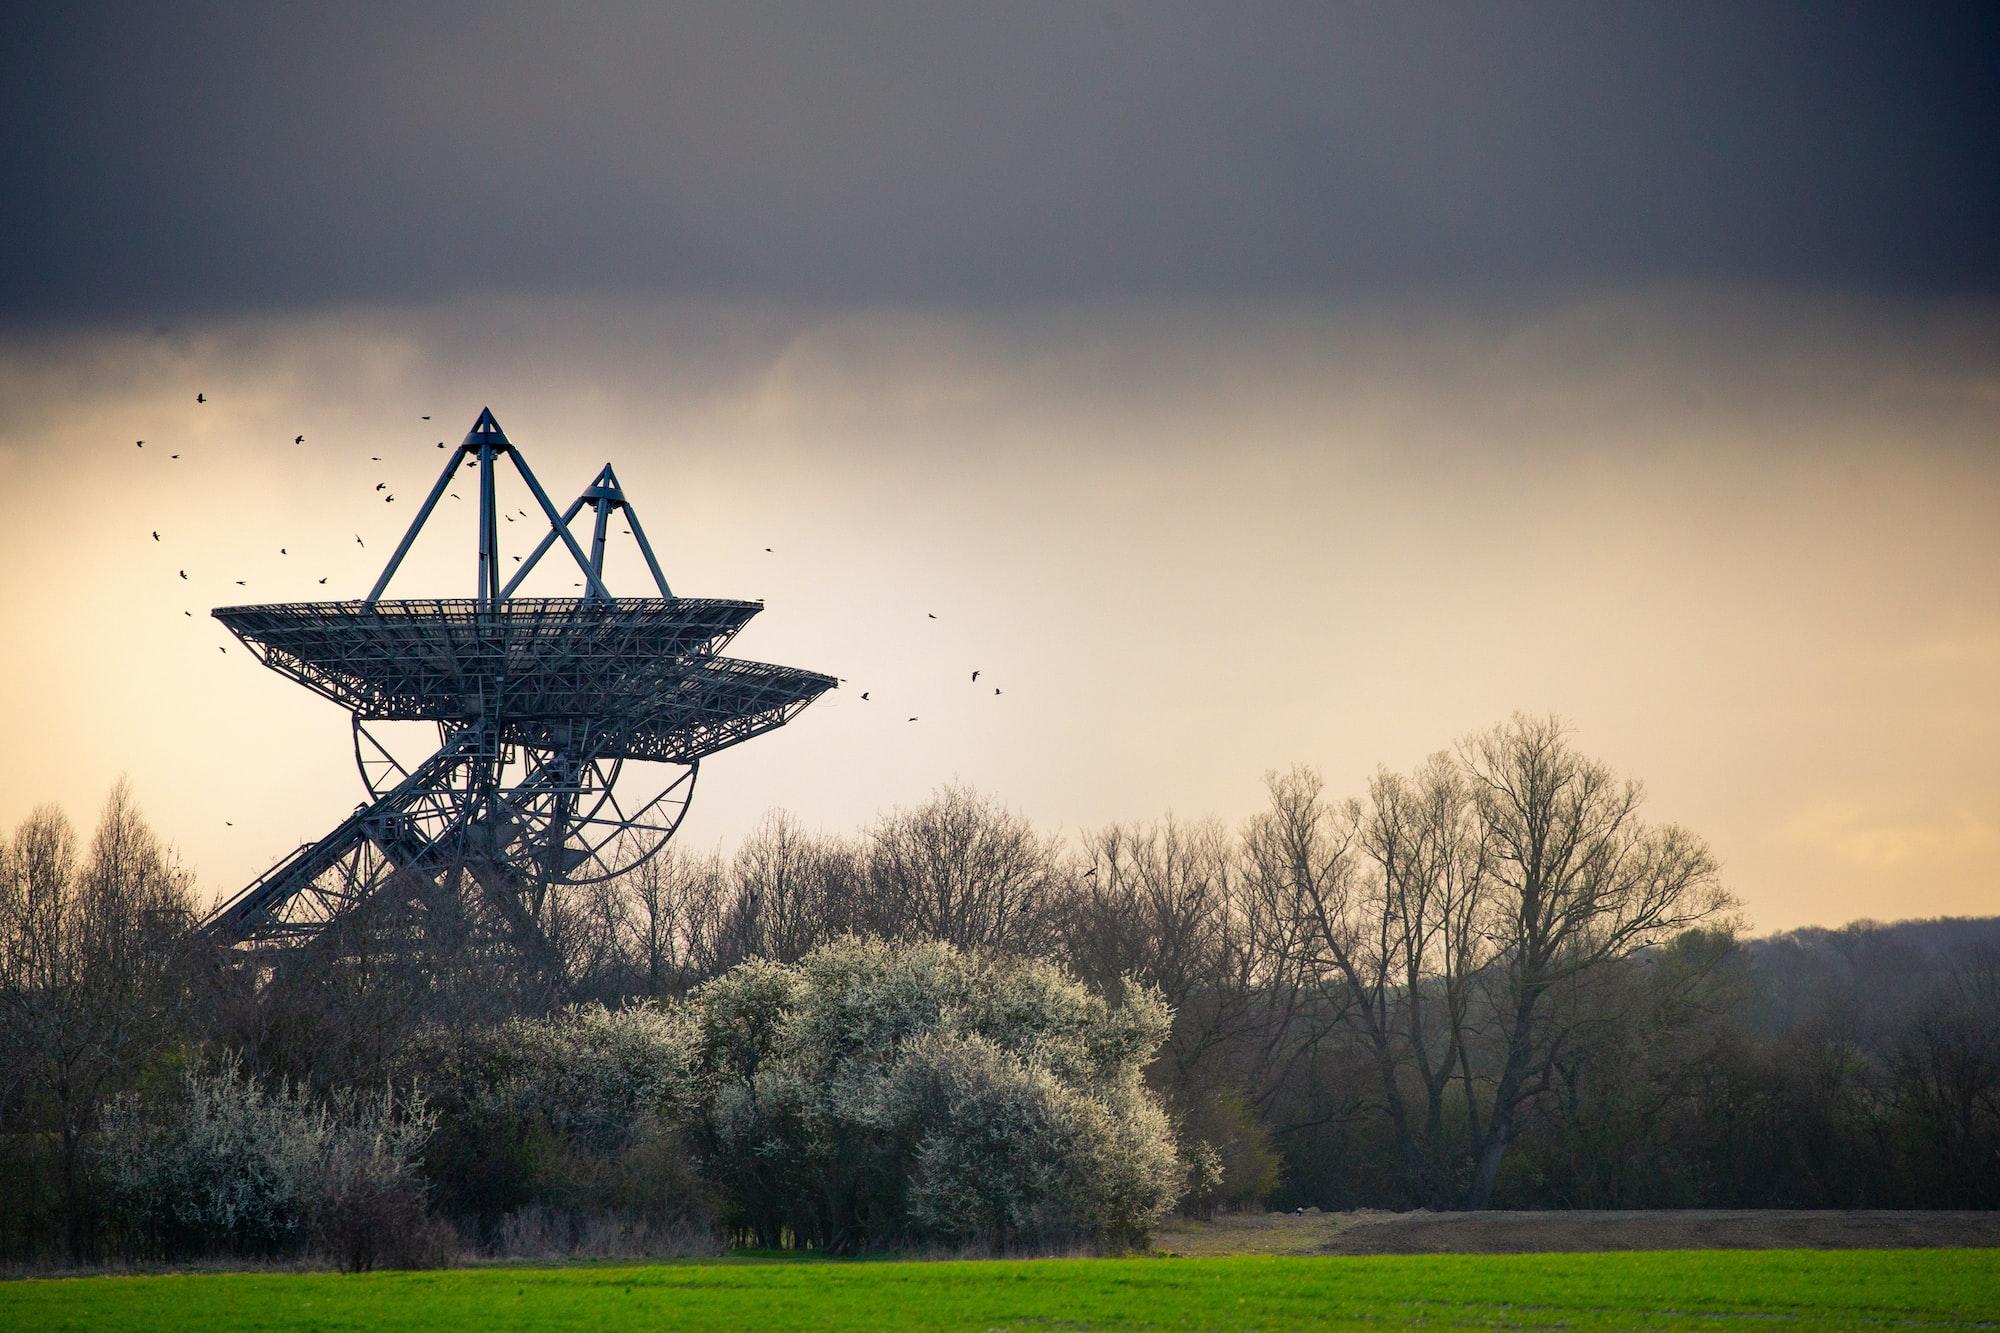 More Satellites (more CO2...)